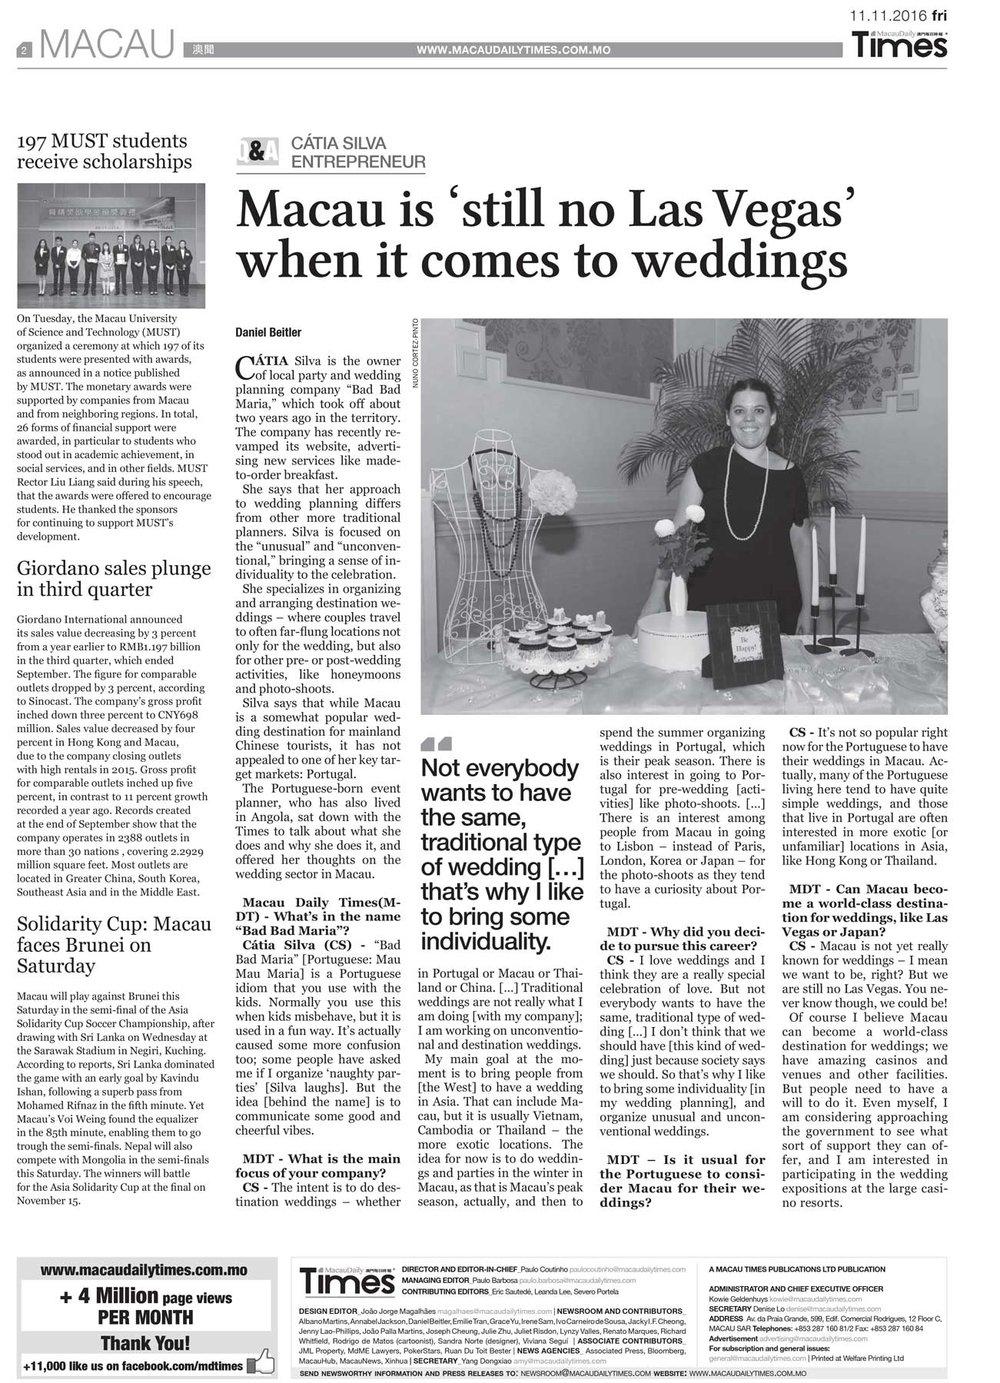 Macau Daily Times, Novembro 2016